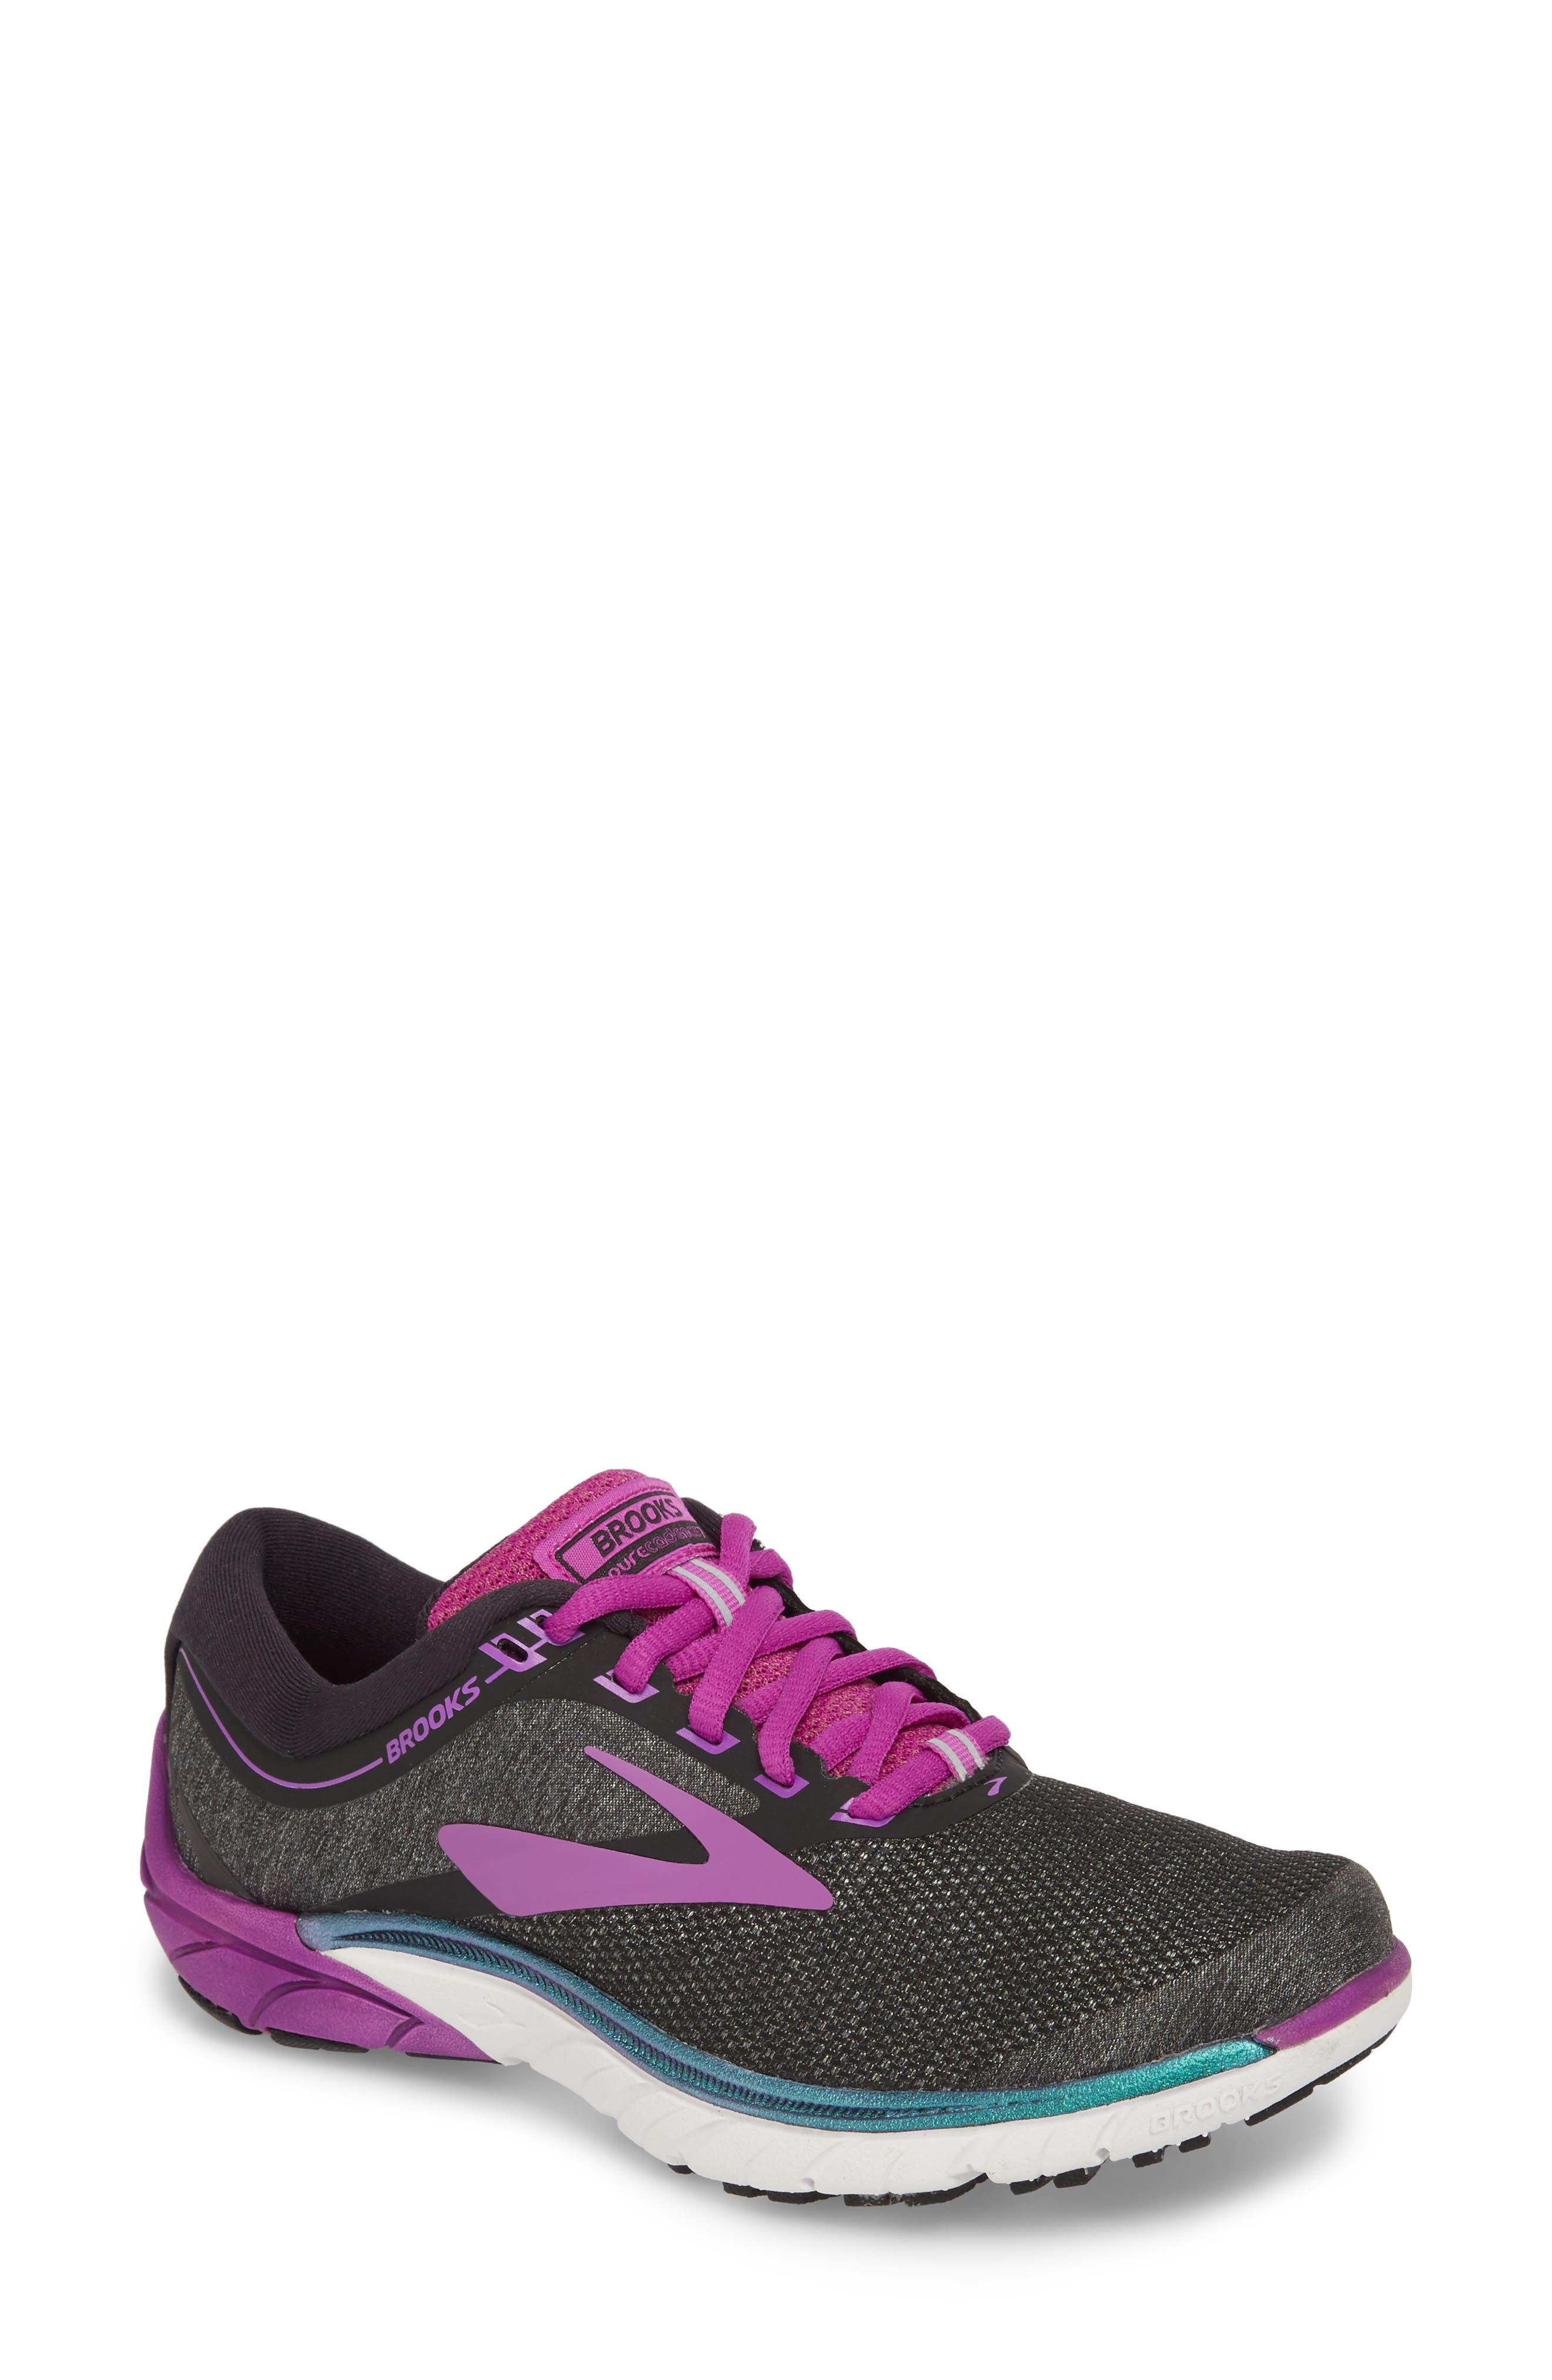 ,                             PureCadence 7 Road Running Shoe,                             Main thumbnail 1, color,                             BLACK/ PURPLE/ MULTI